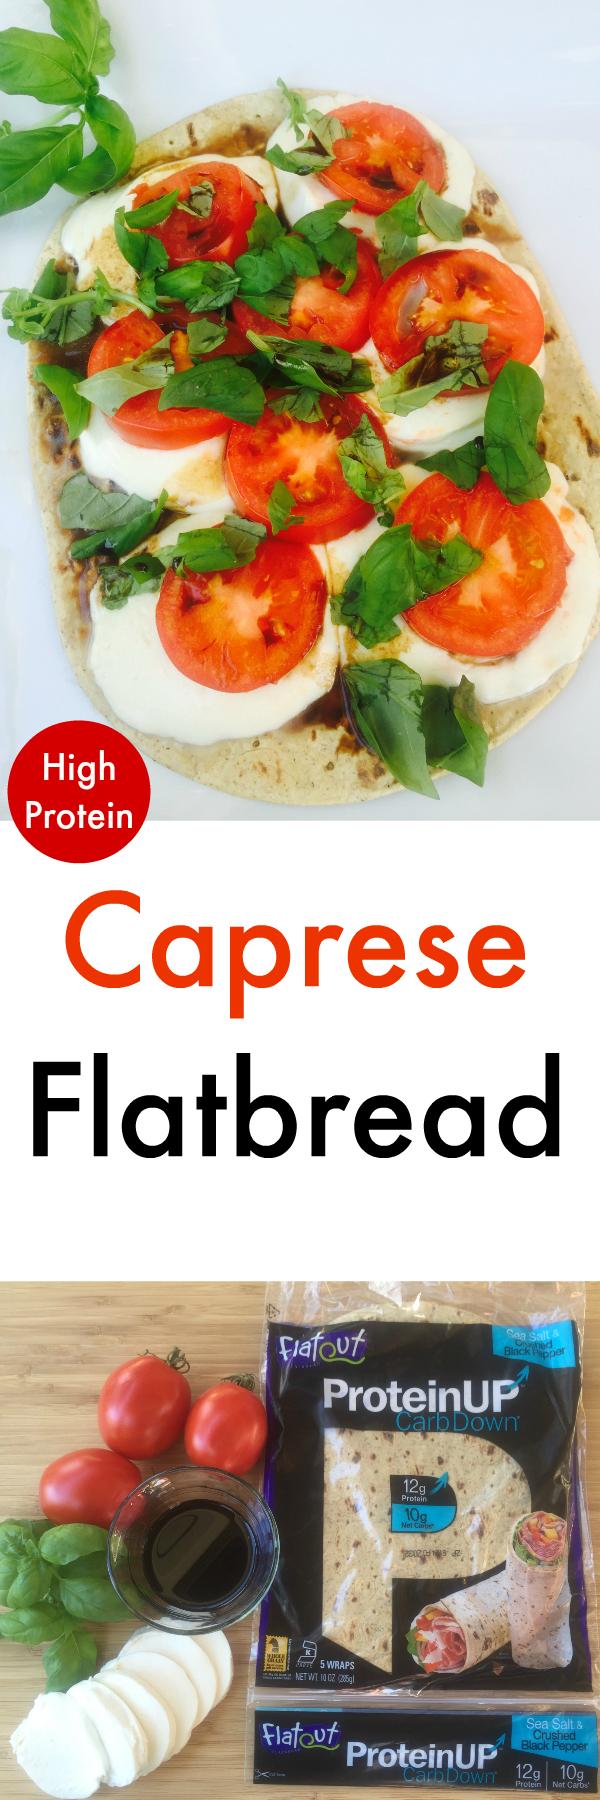 caprese-flatbread-pinterest